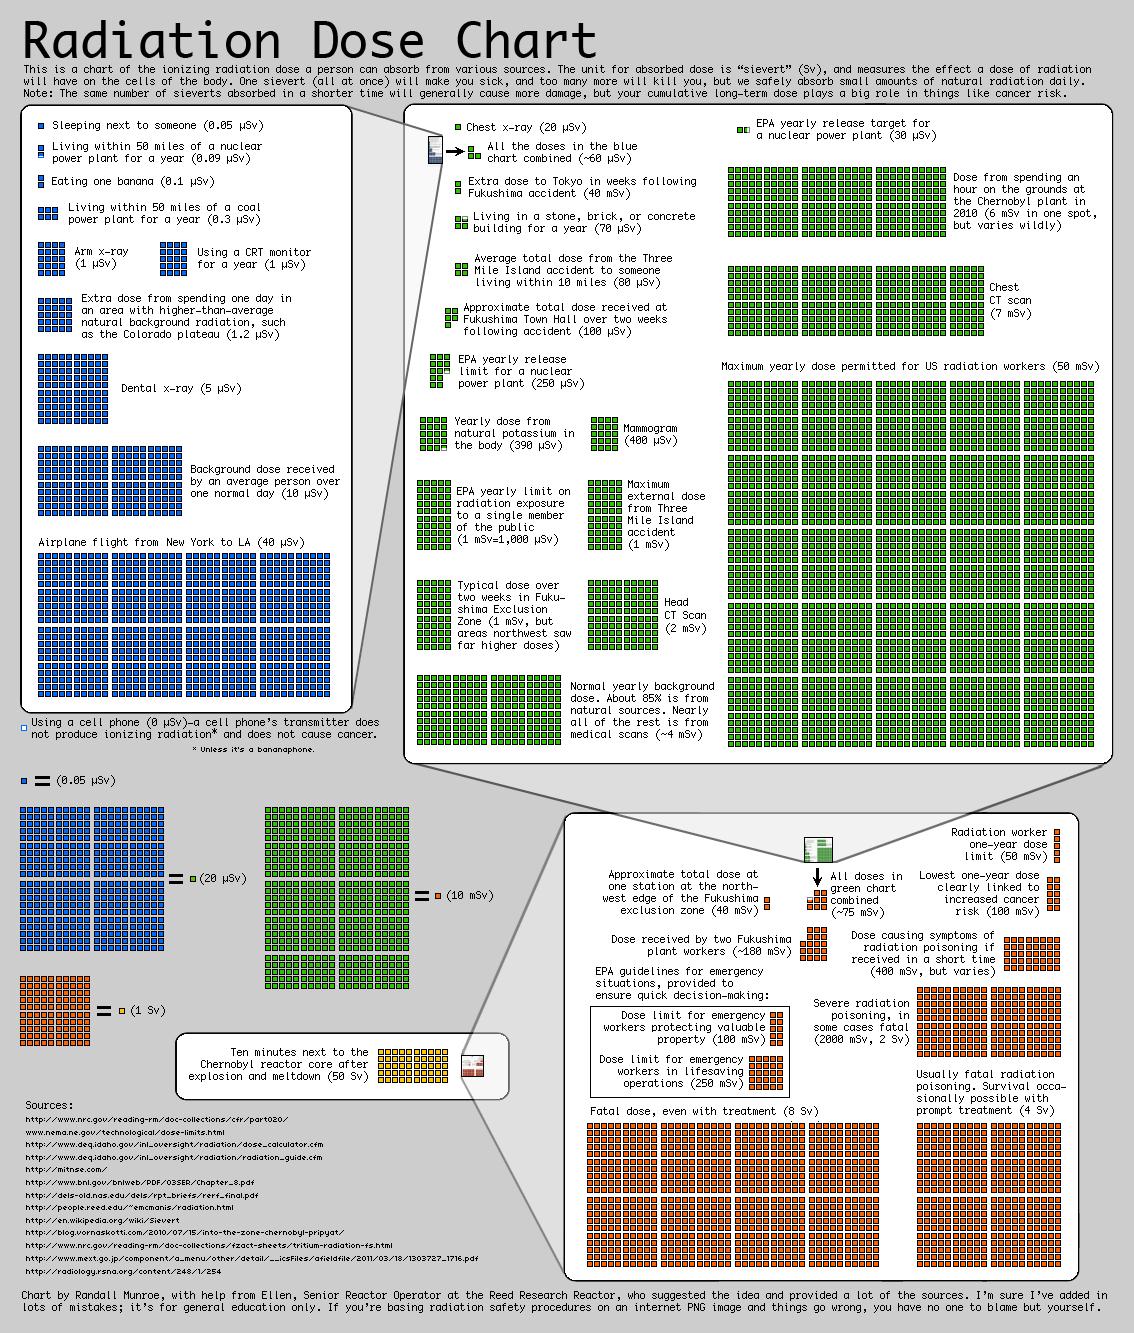 2.4.3 afflication leveling guide